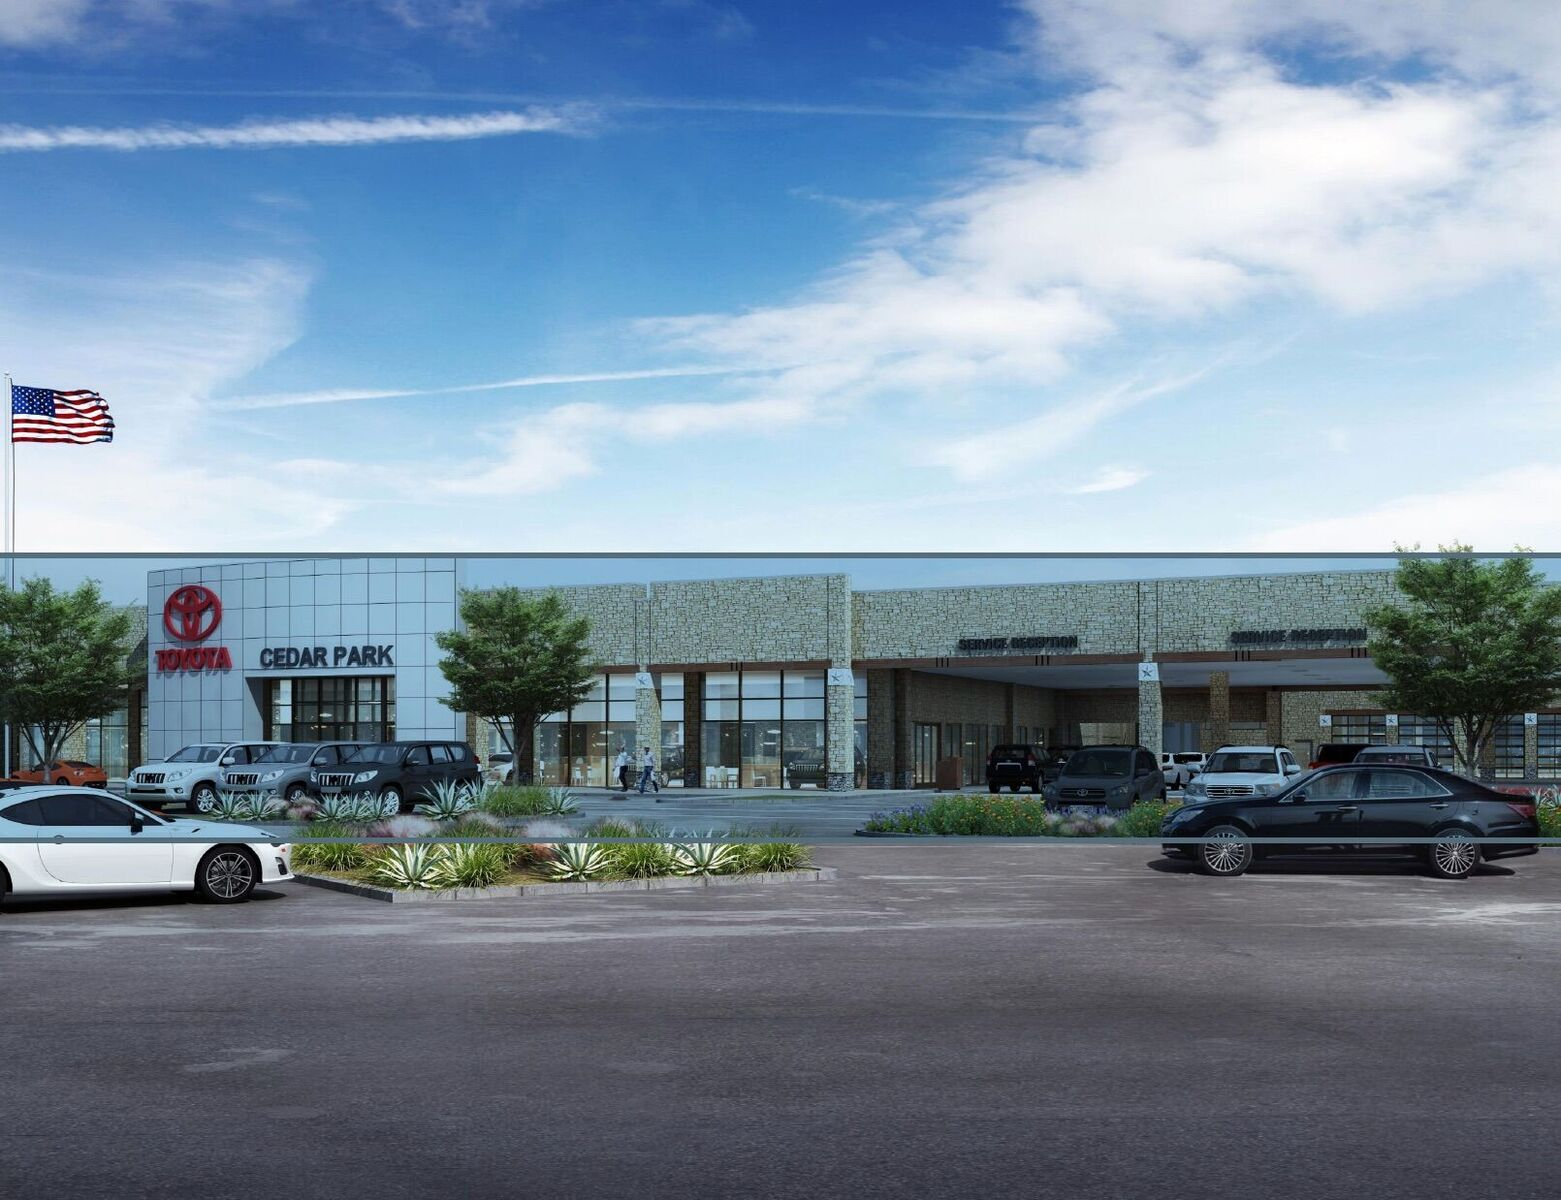 cavender auto family plans dealership in austin area san antonio express news. Black Bedroom Furniture Sets. Home Design Ideas